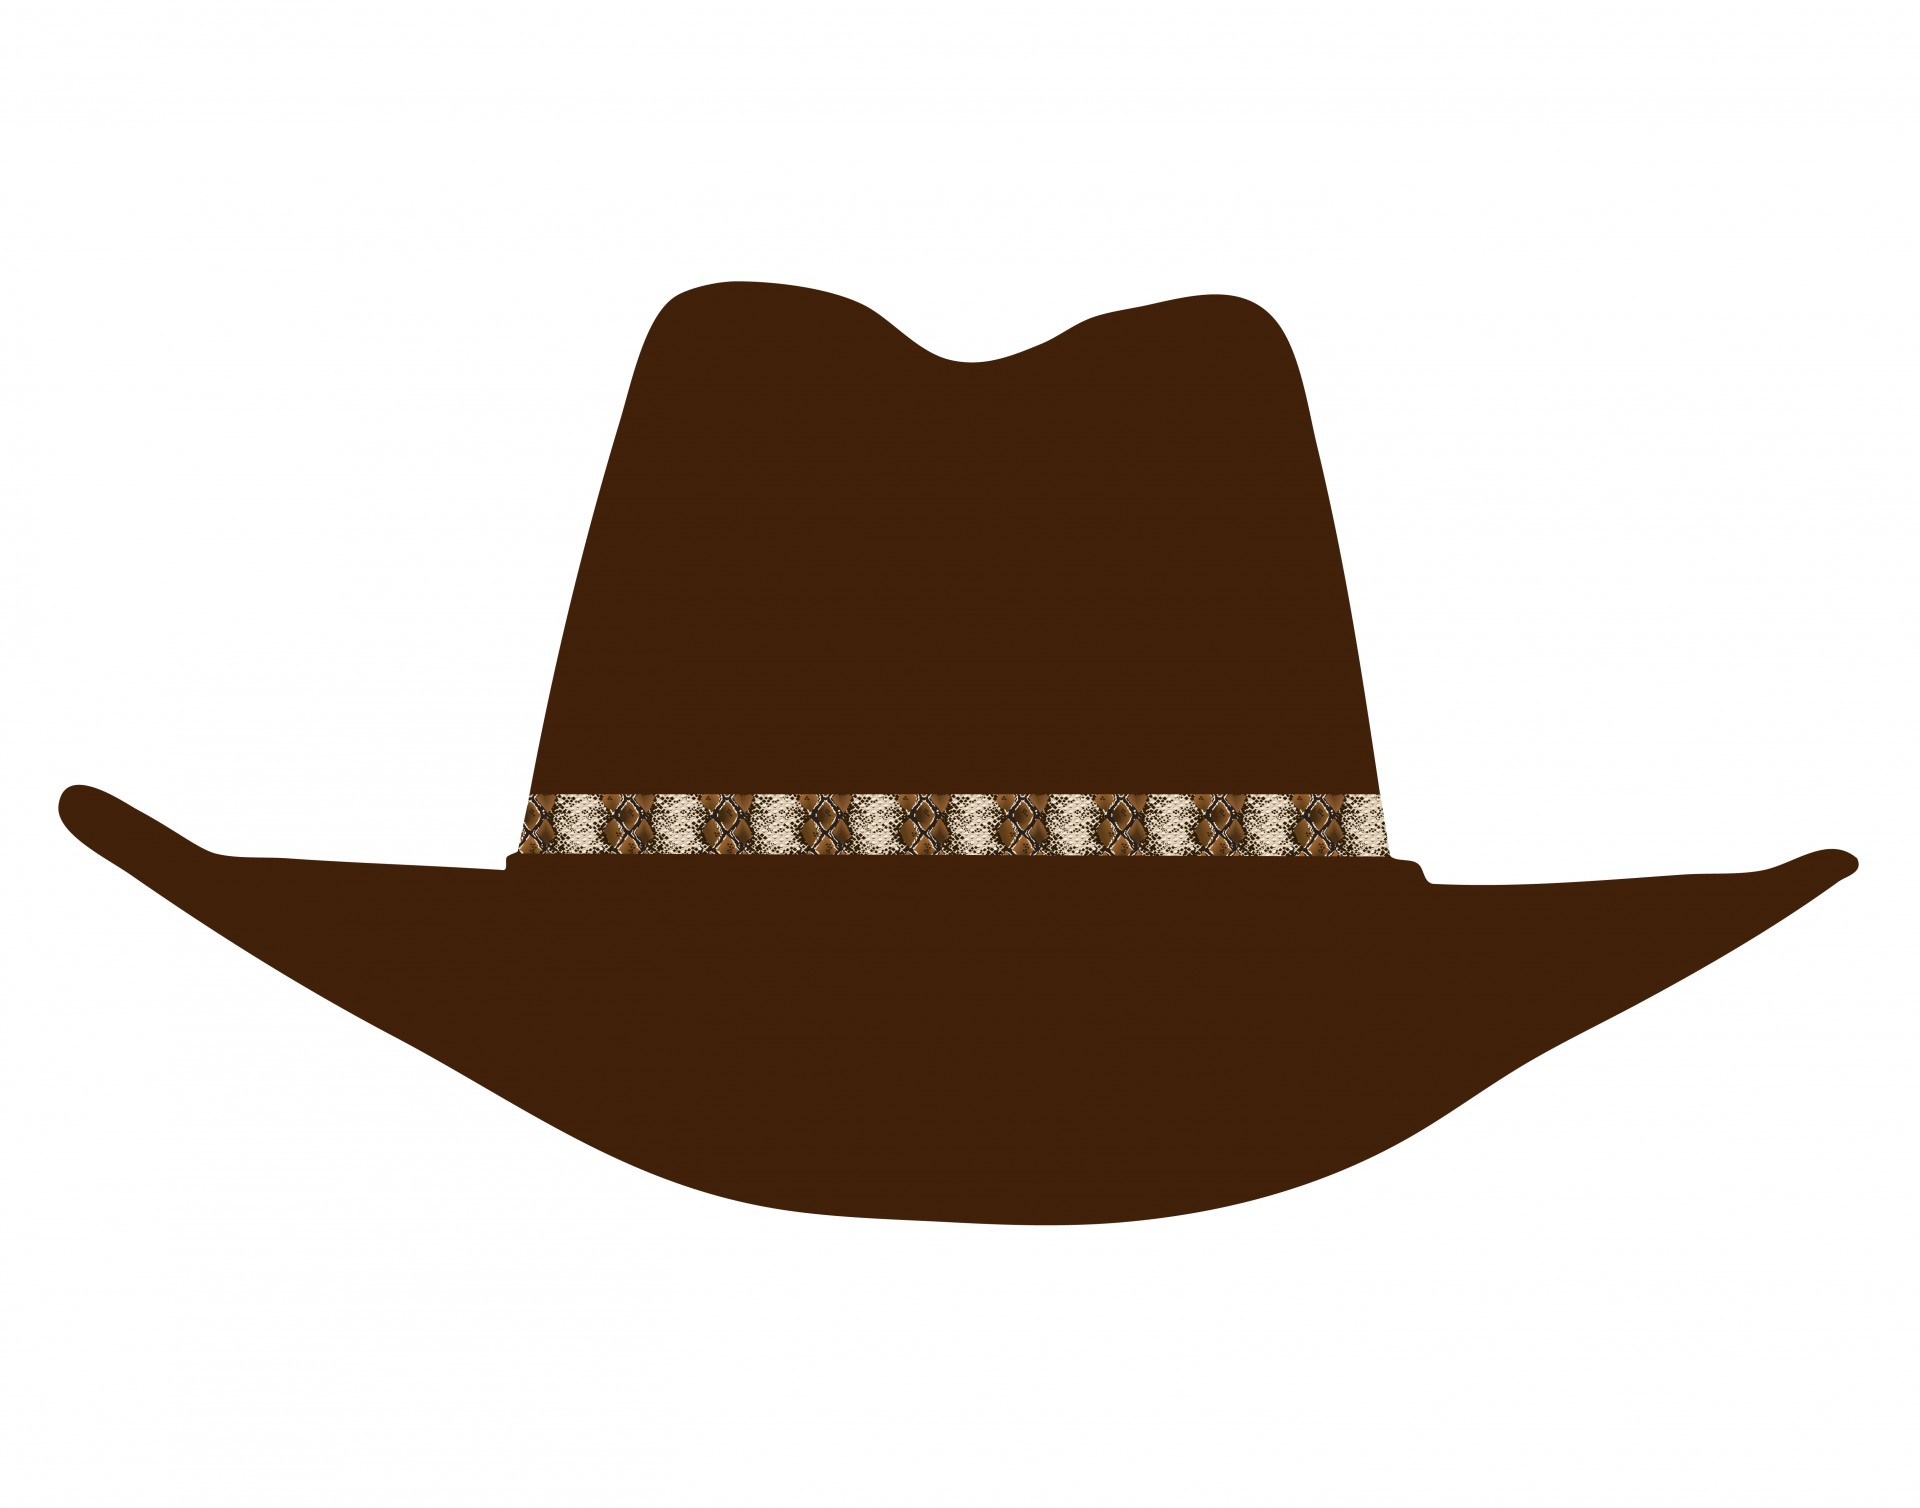 Clip art free stock. 2 clipart cowboy hat